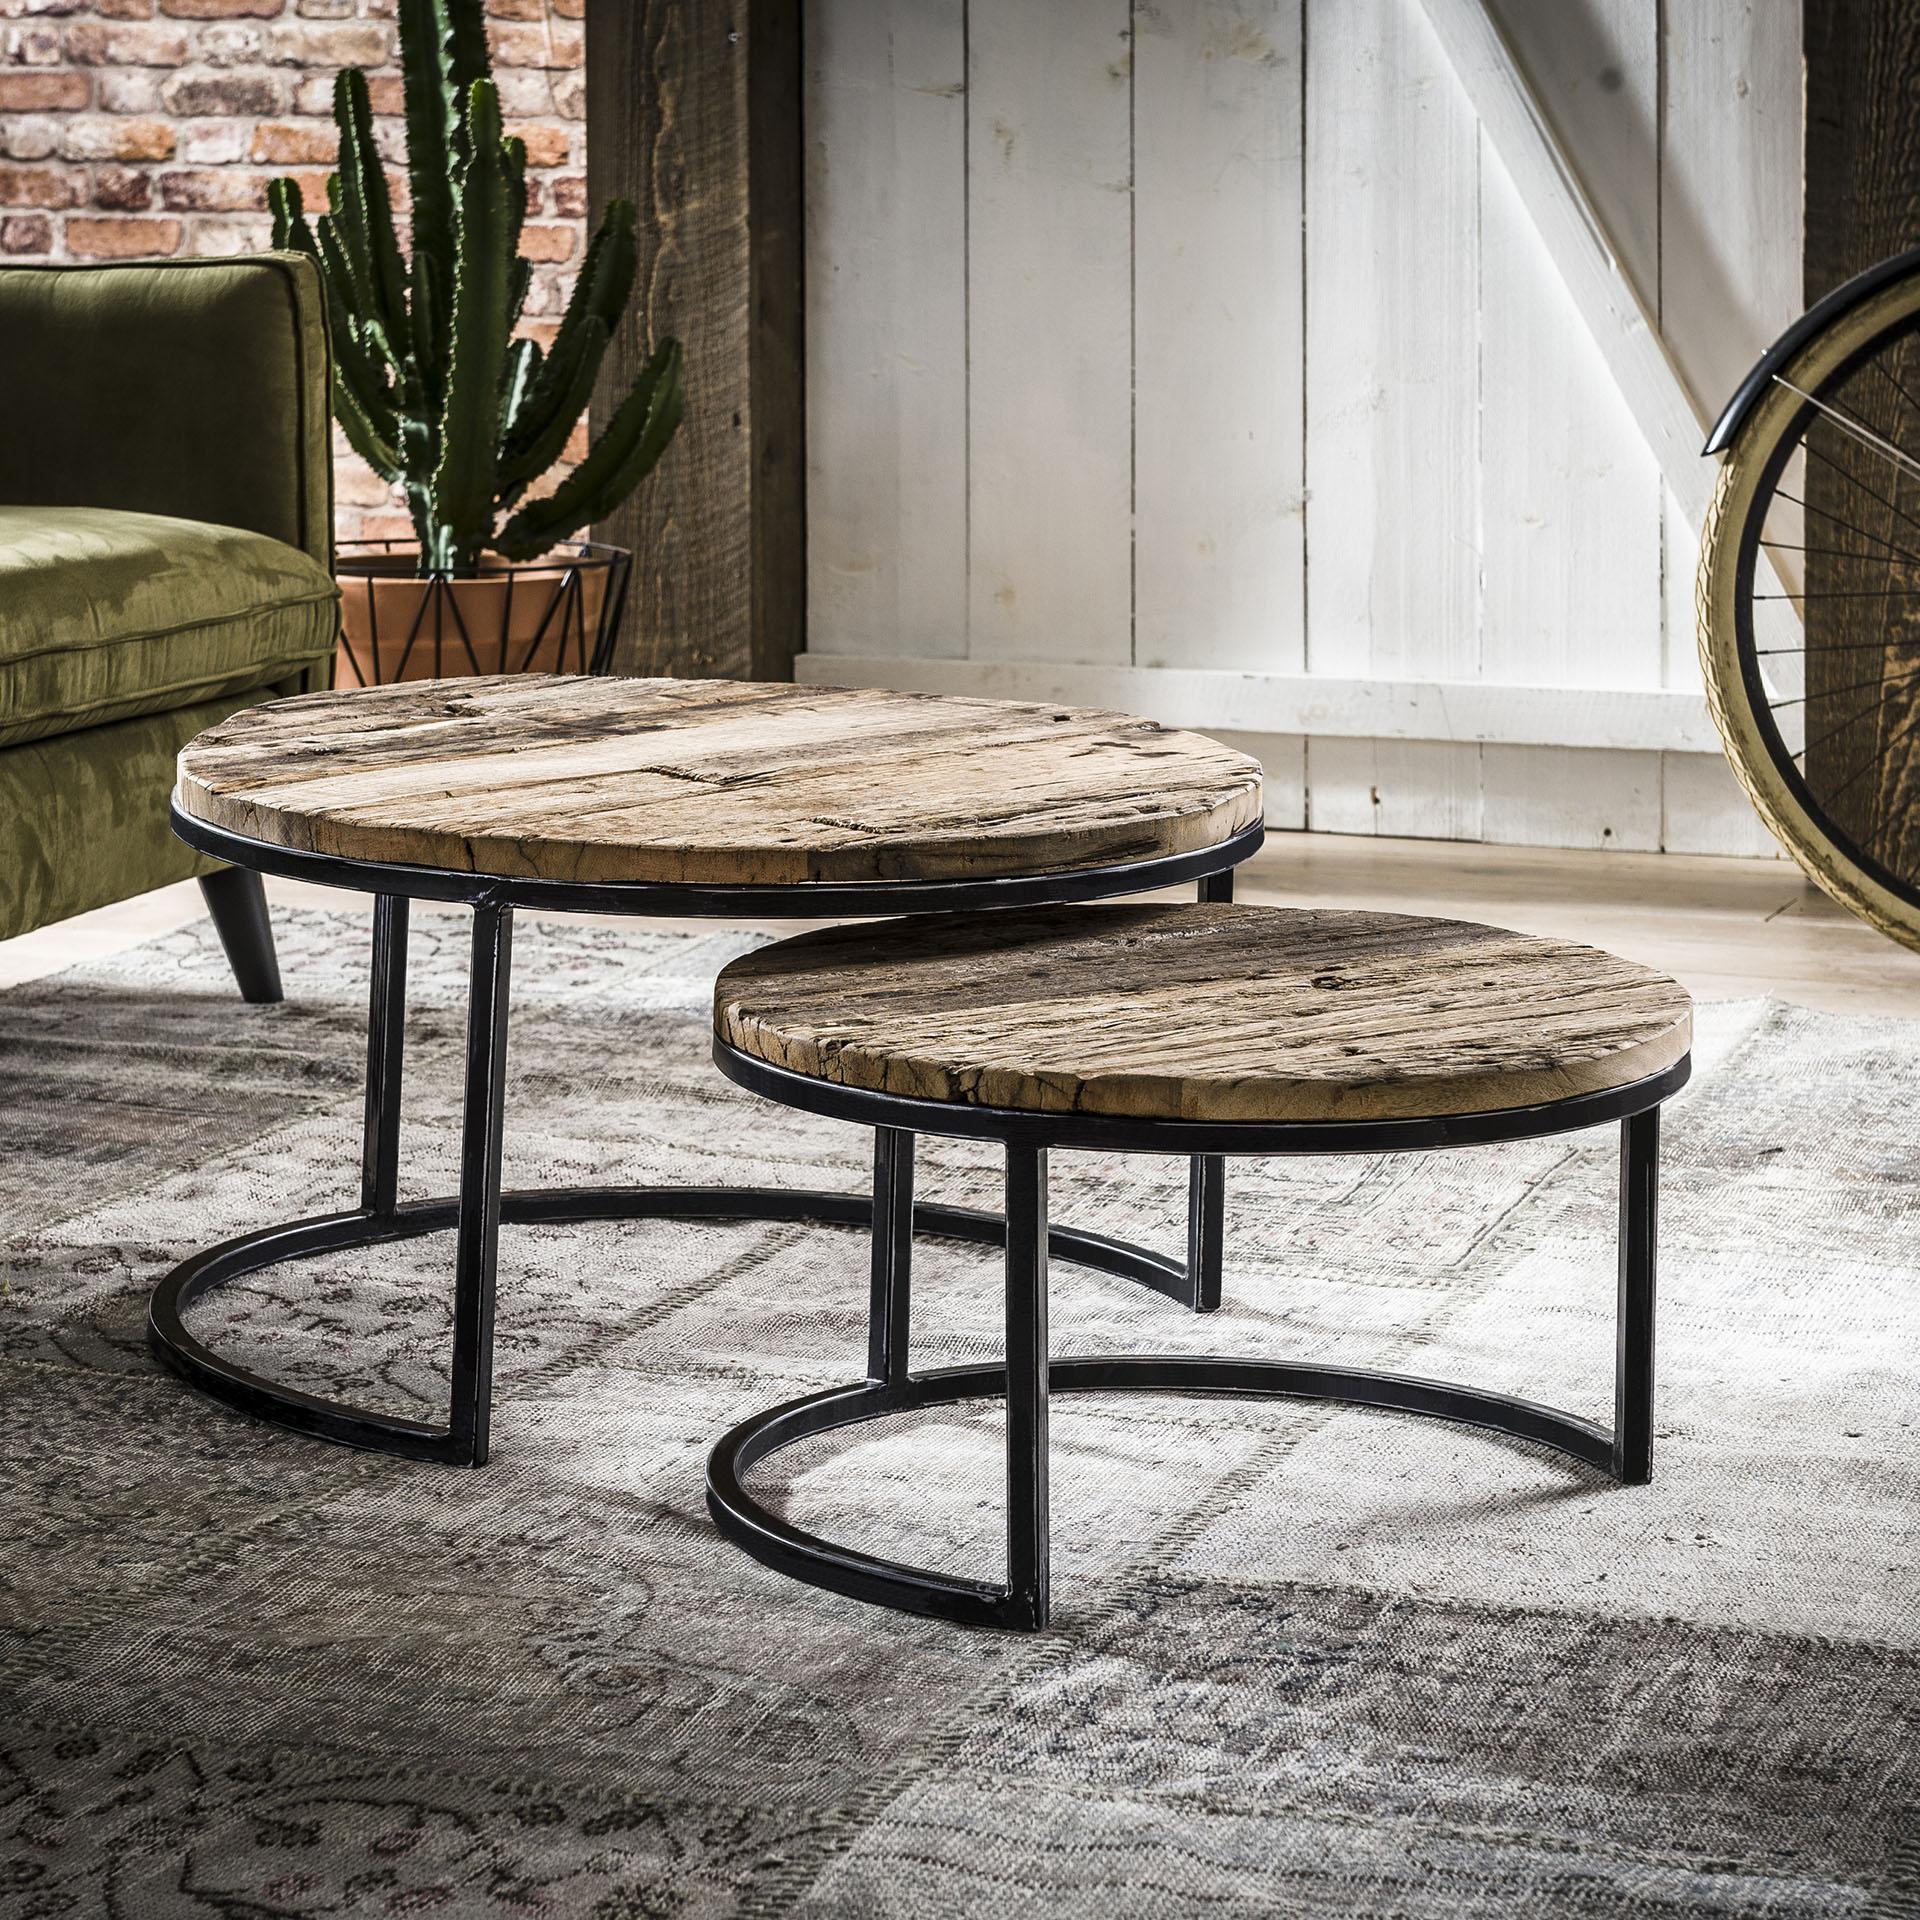 Uw partner in meubels: Salontafel 'Marx' Set van 2 stuks Tafels | Salontafels